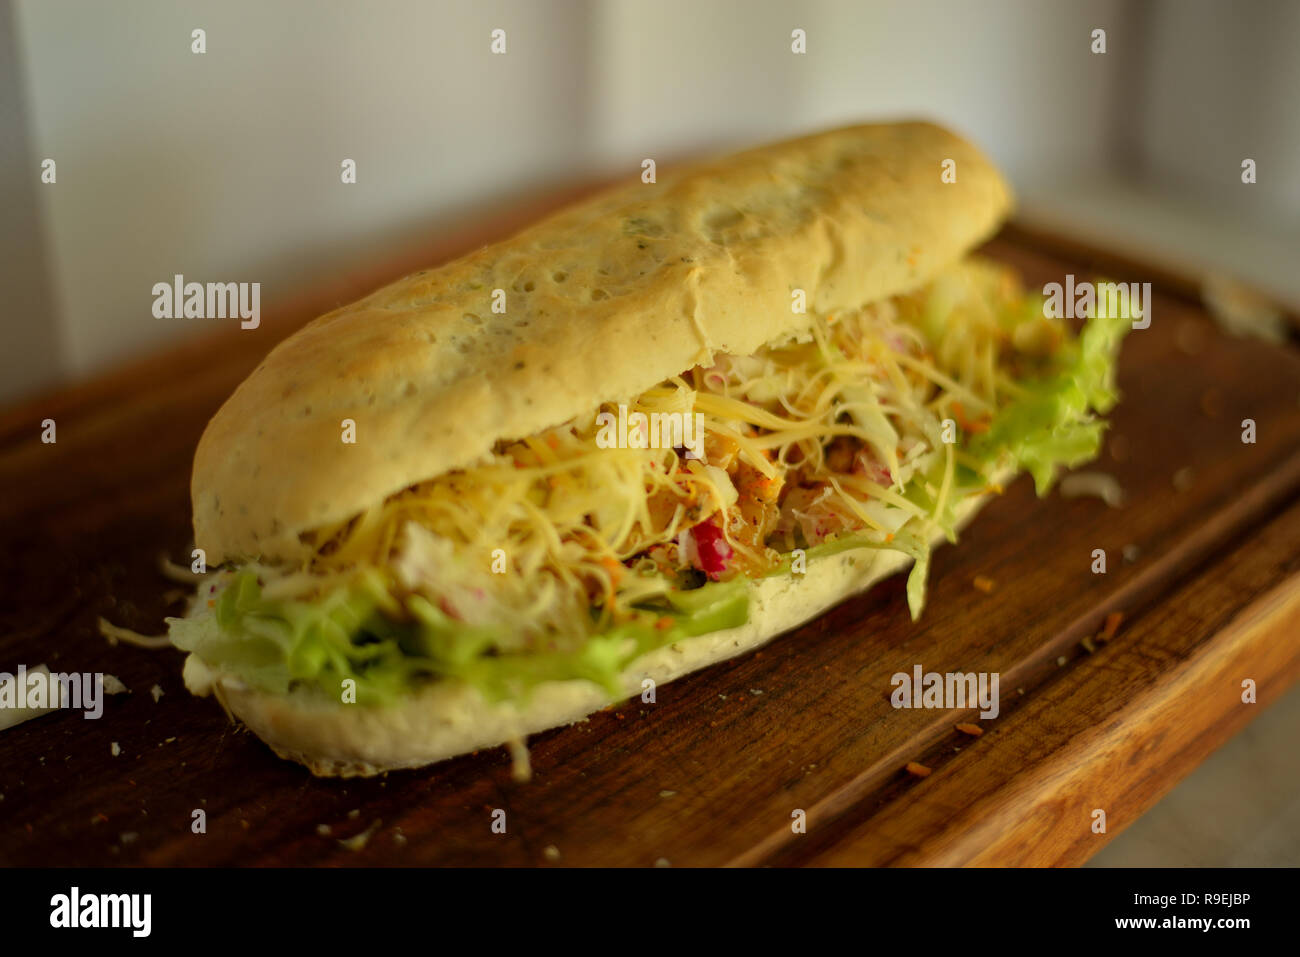 food shooter - Stock Image